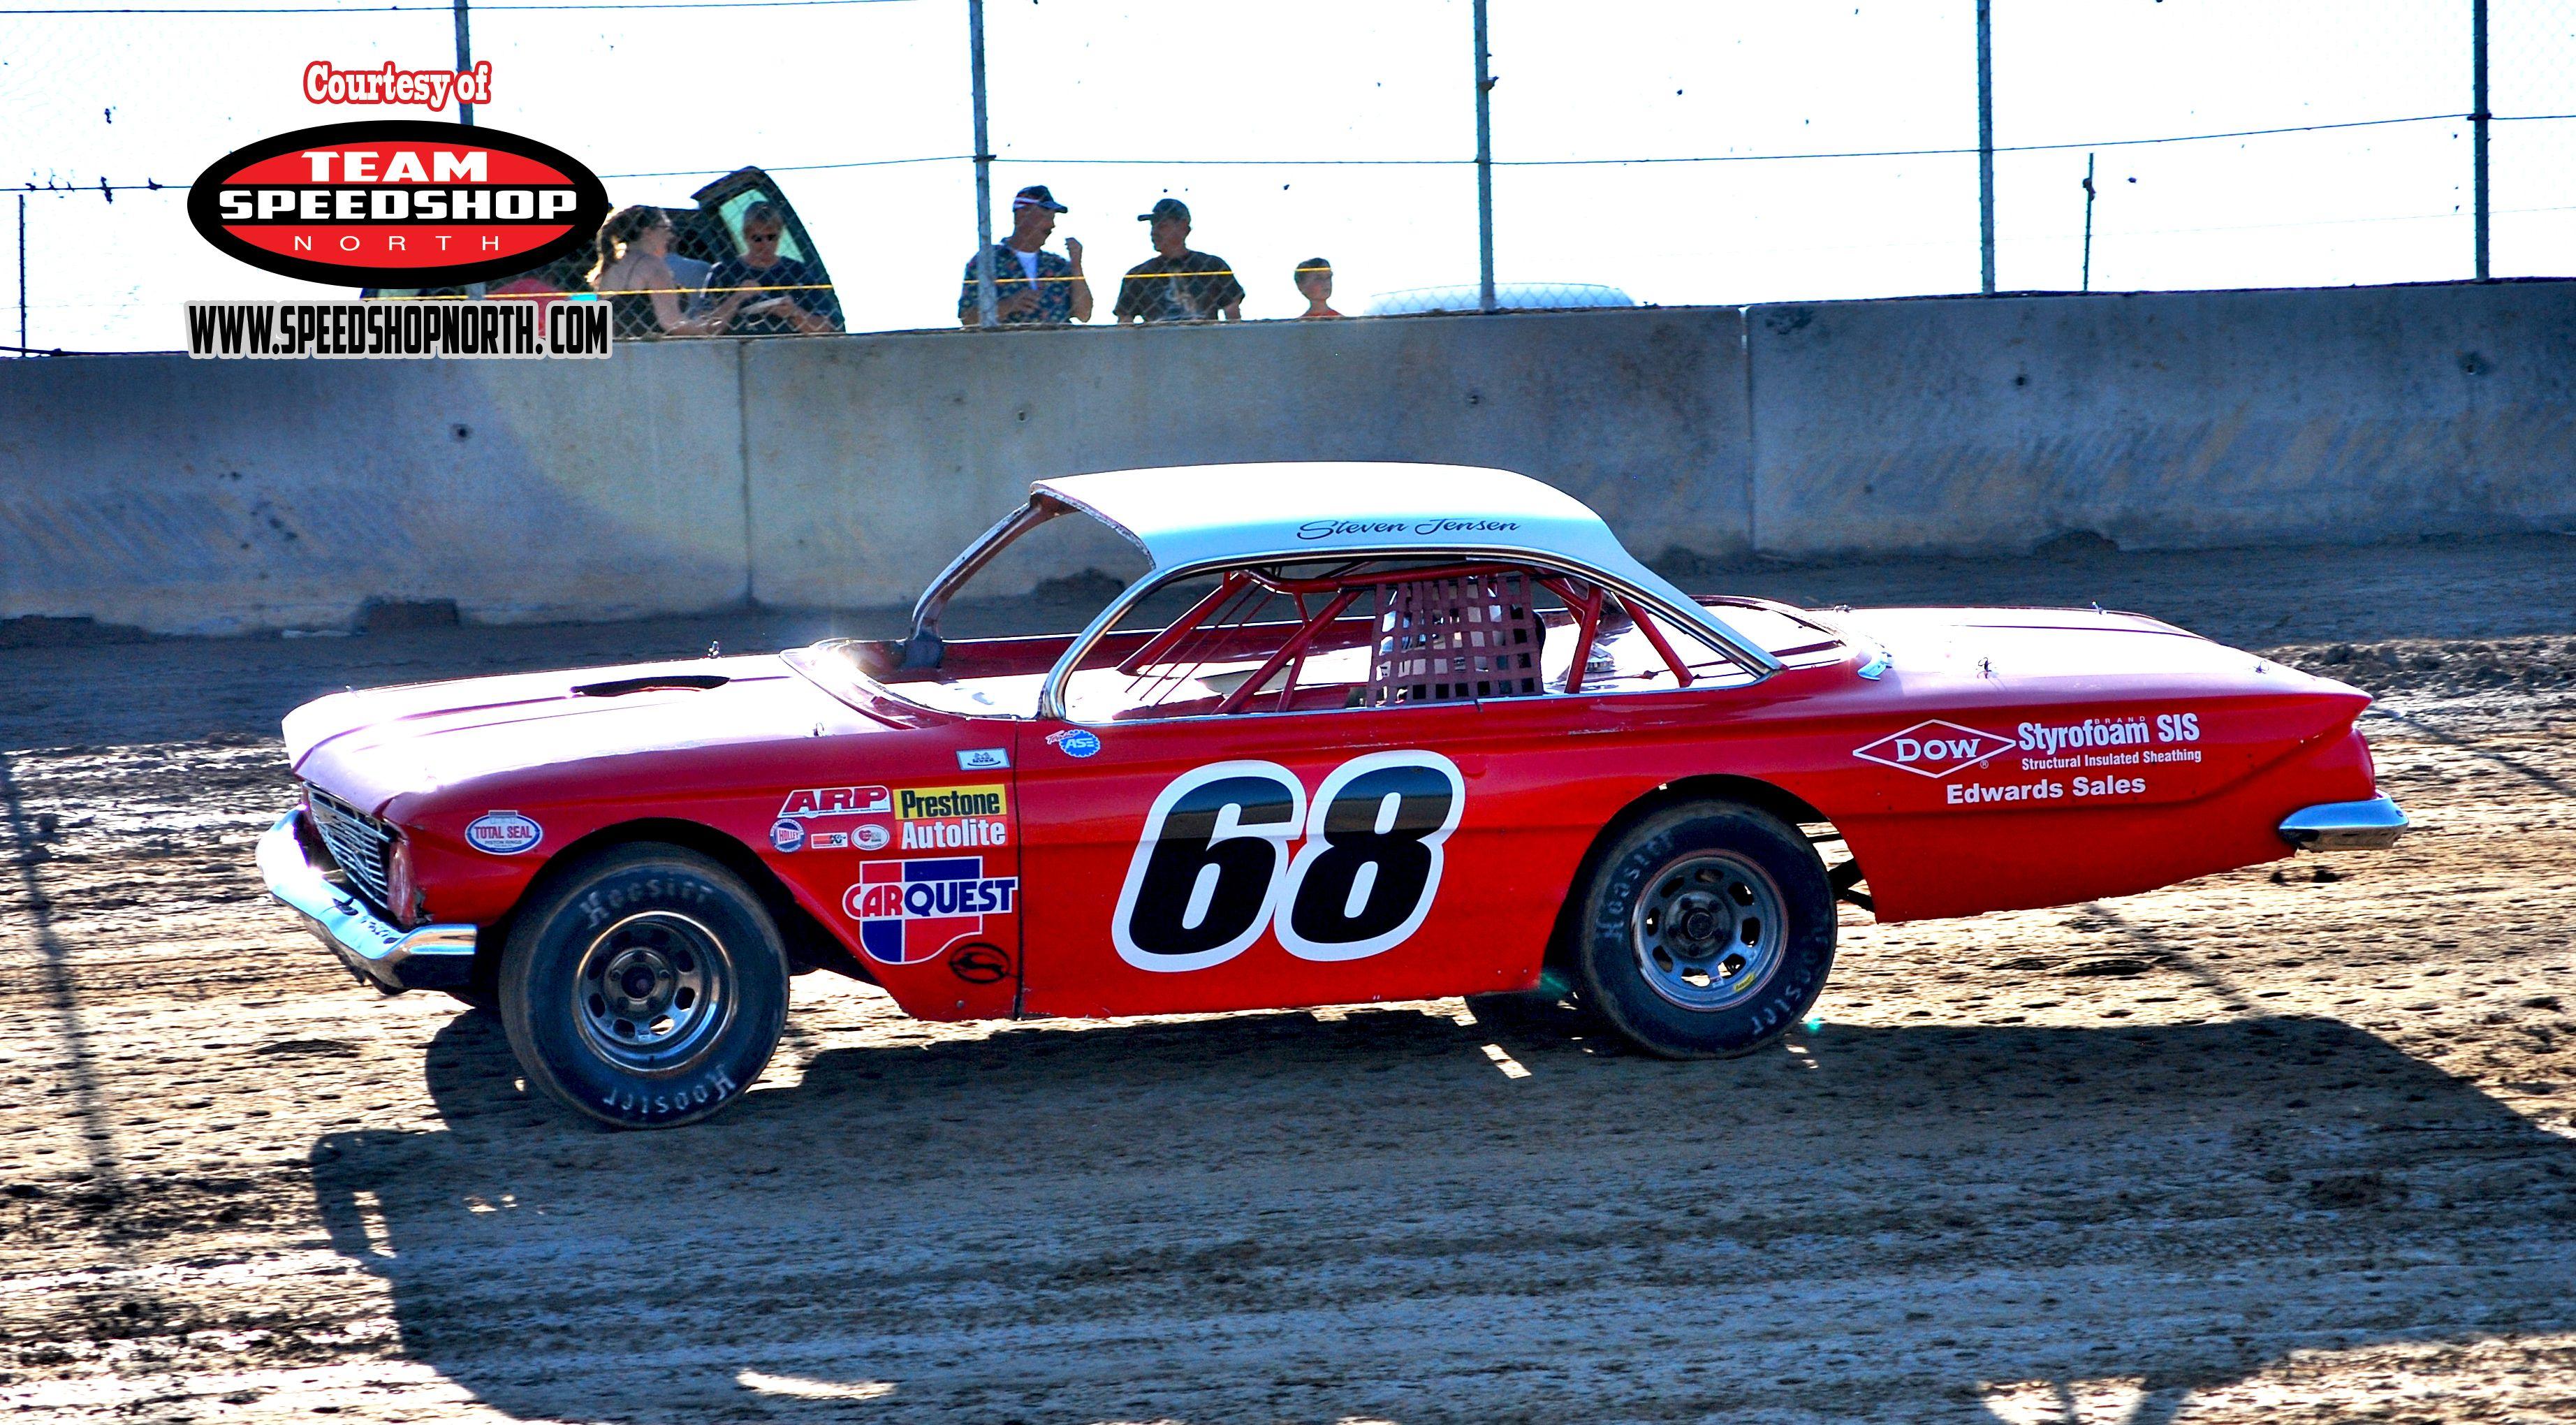 Dirt Track Race Cars: Vintage Dirt Car #68 Race Car